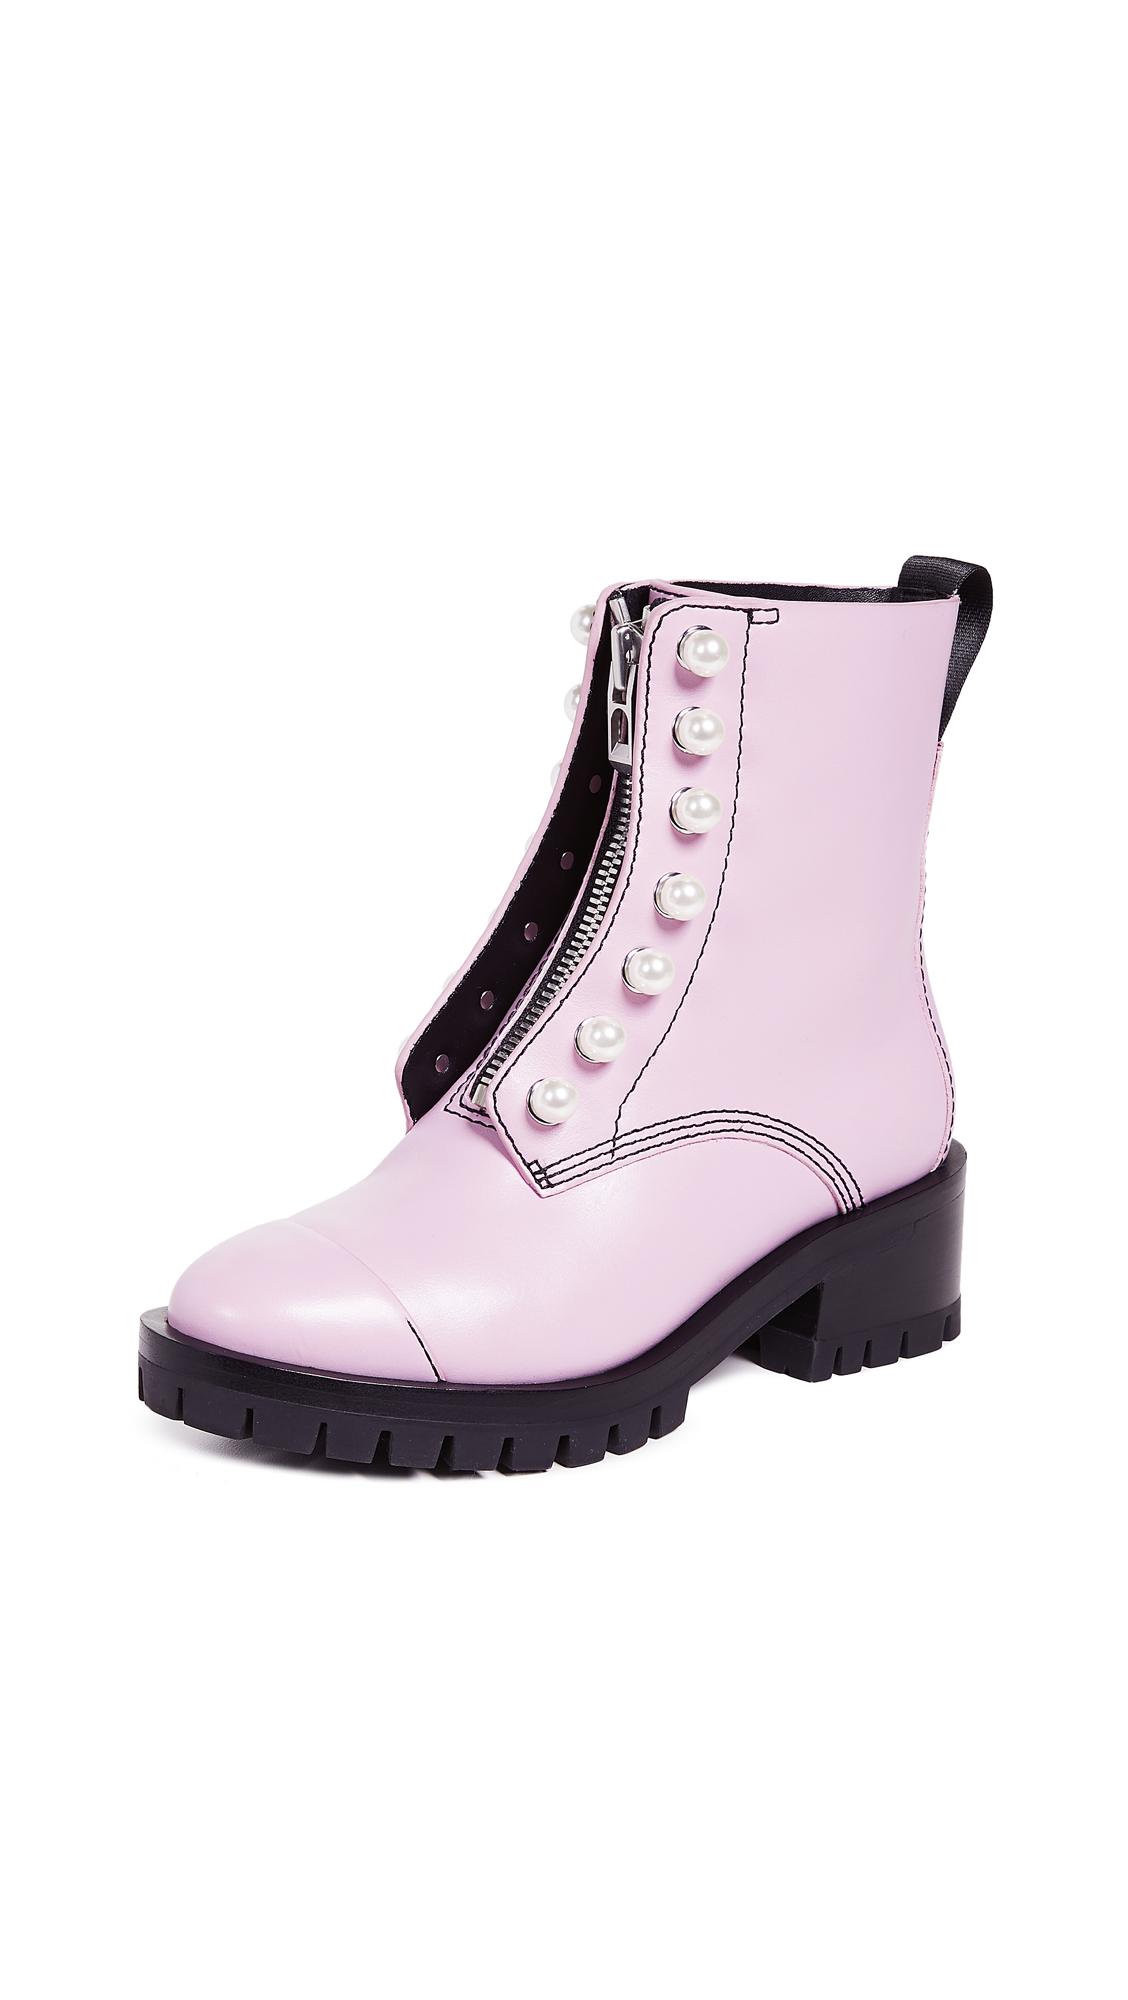 3.1 Phillip Lim Hayett Lug Sole Boots - Blossom